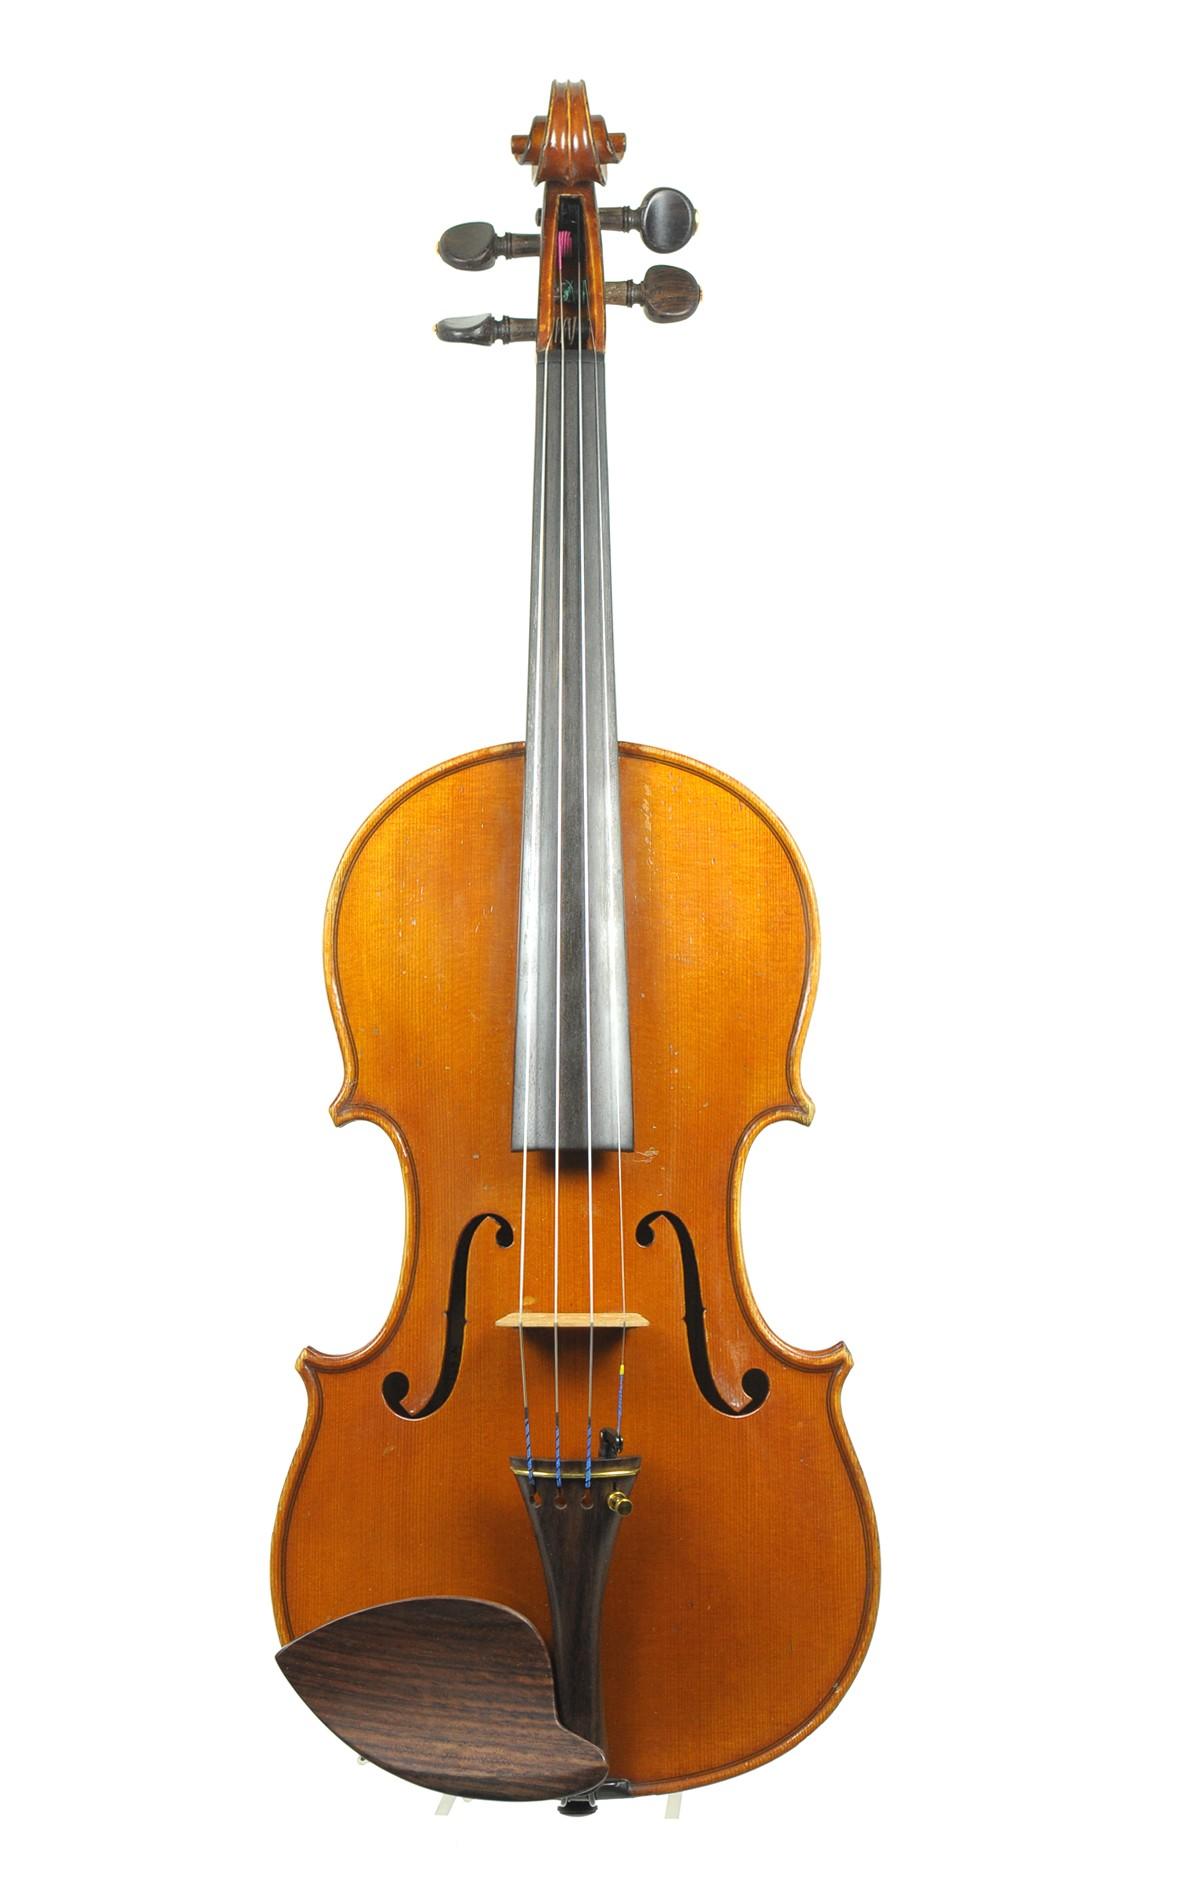 French violin, Marc Laberte atelier no. 657 - spruce top